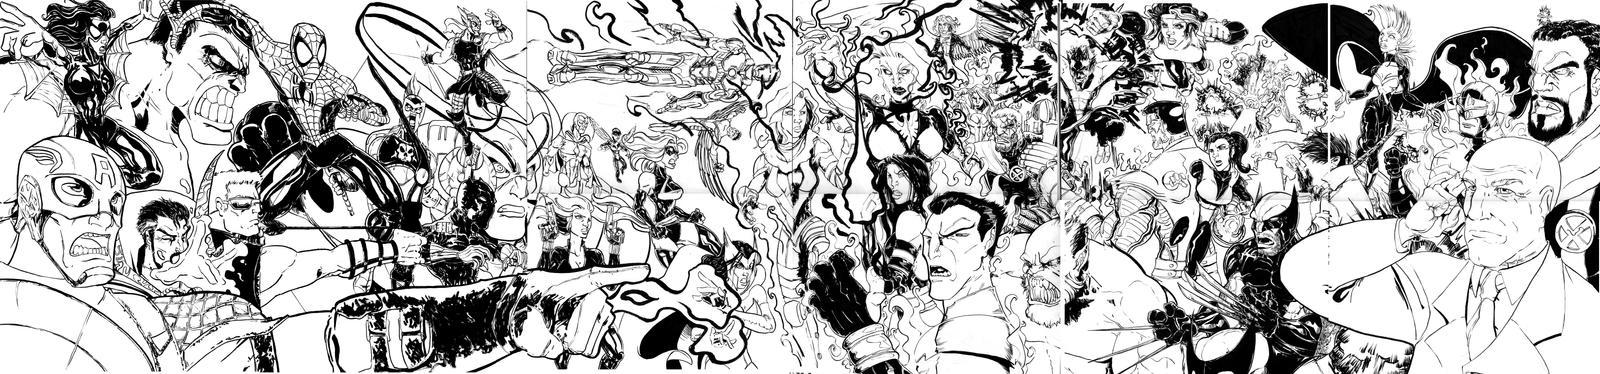 Avengers VS X-Men tribute